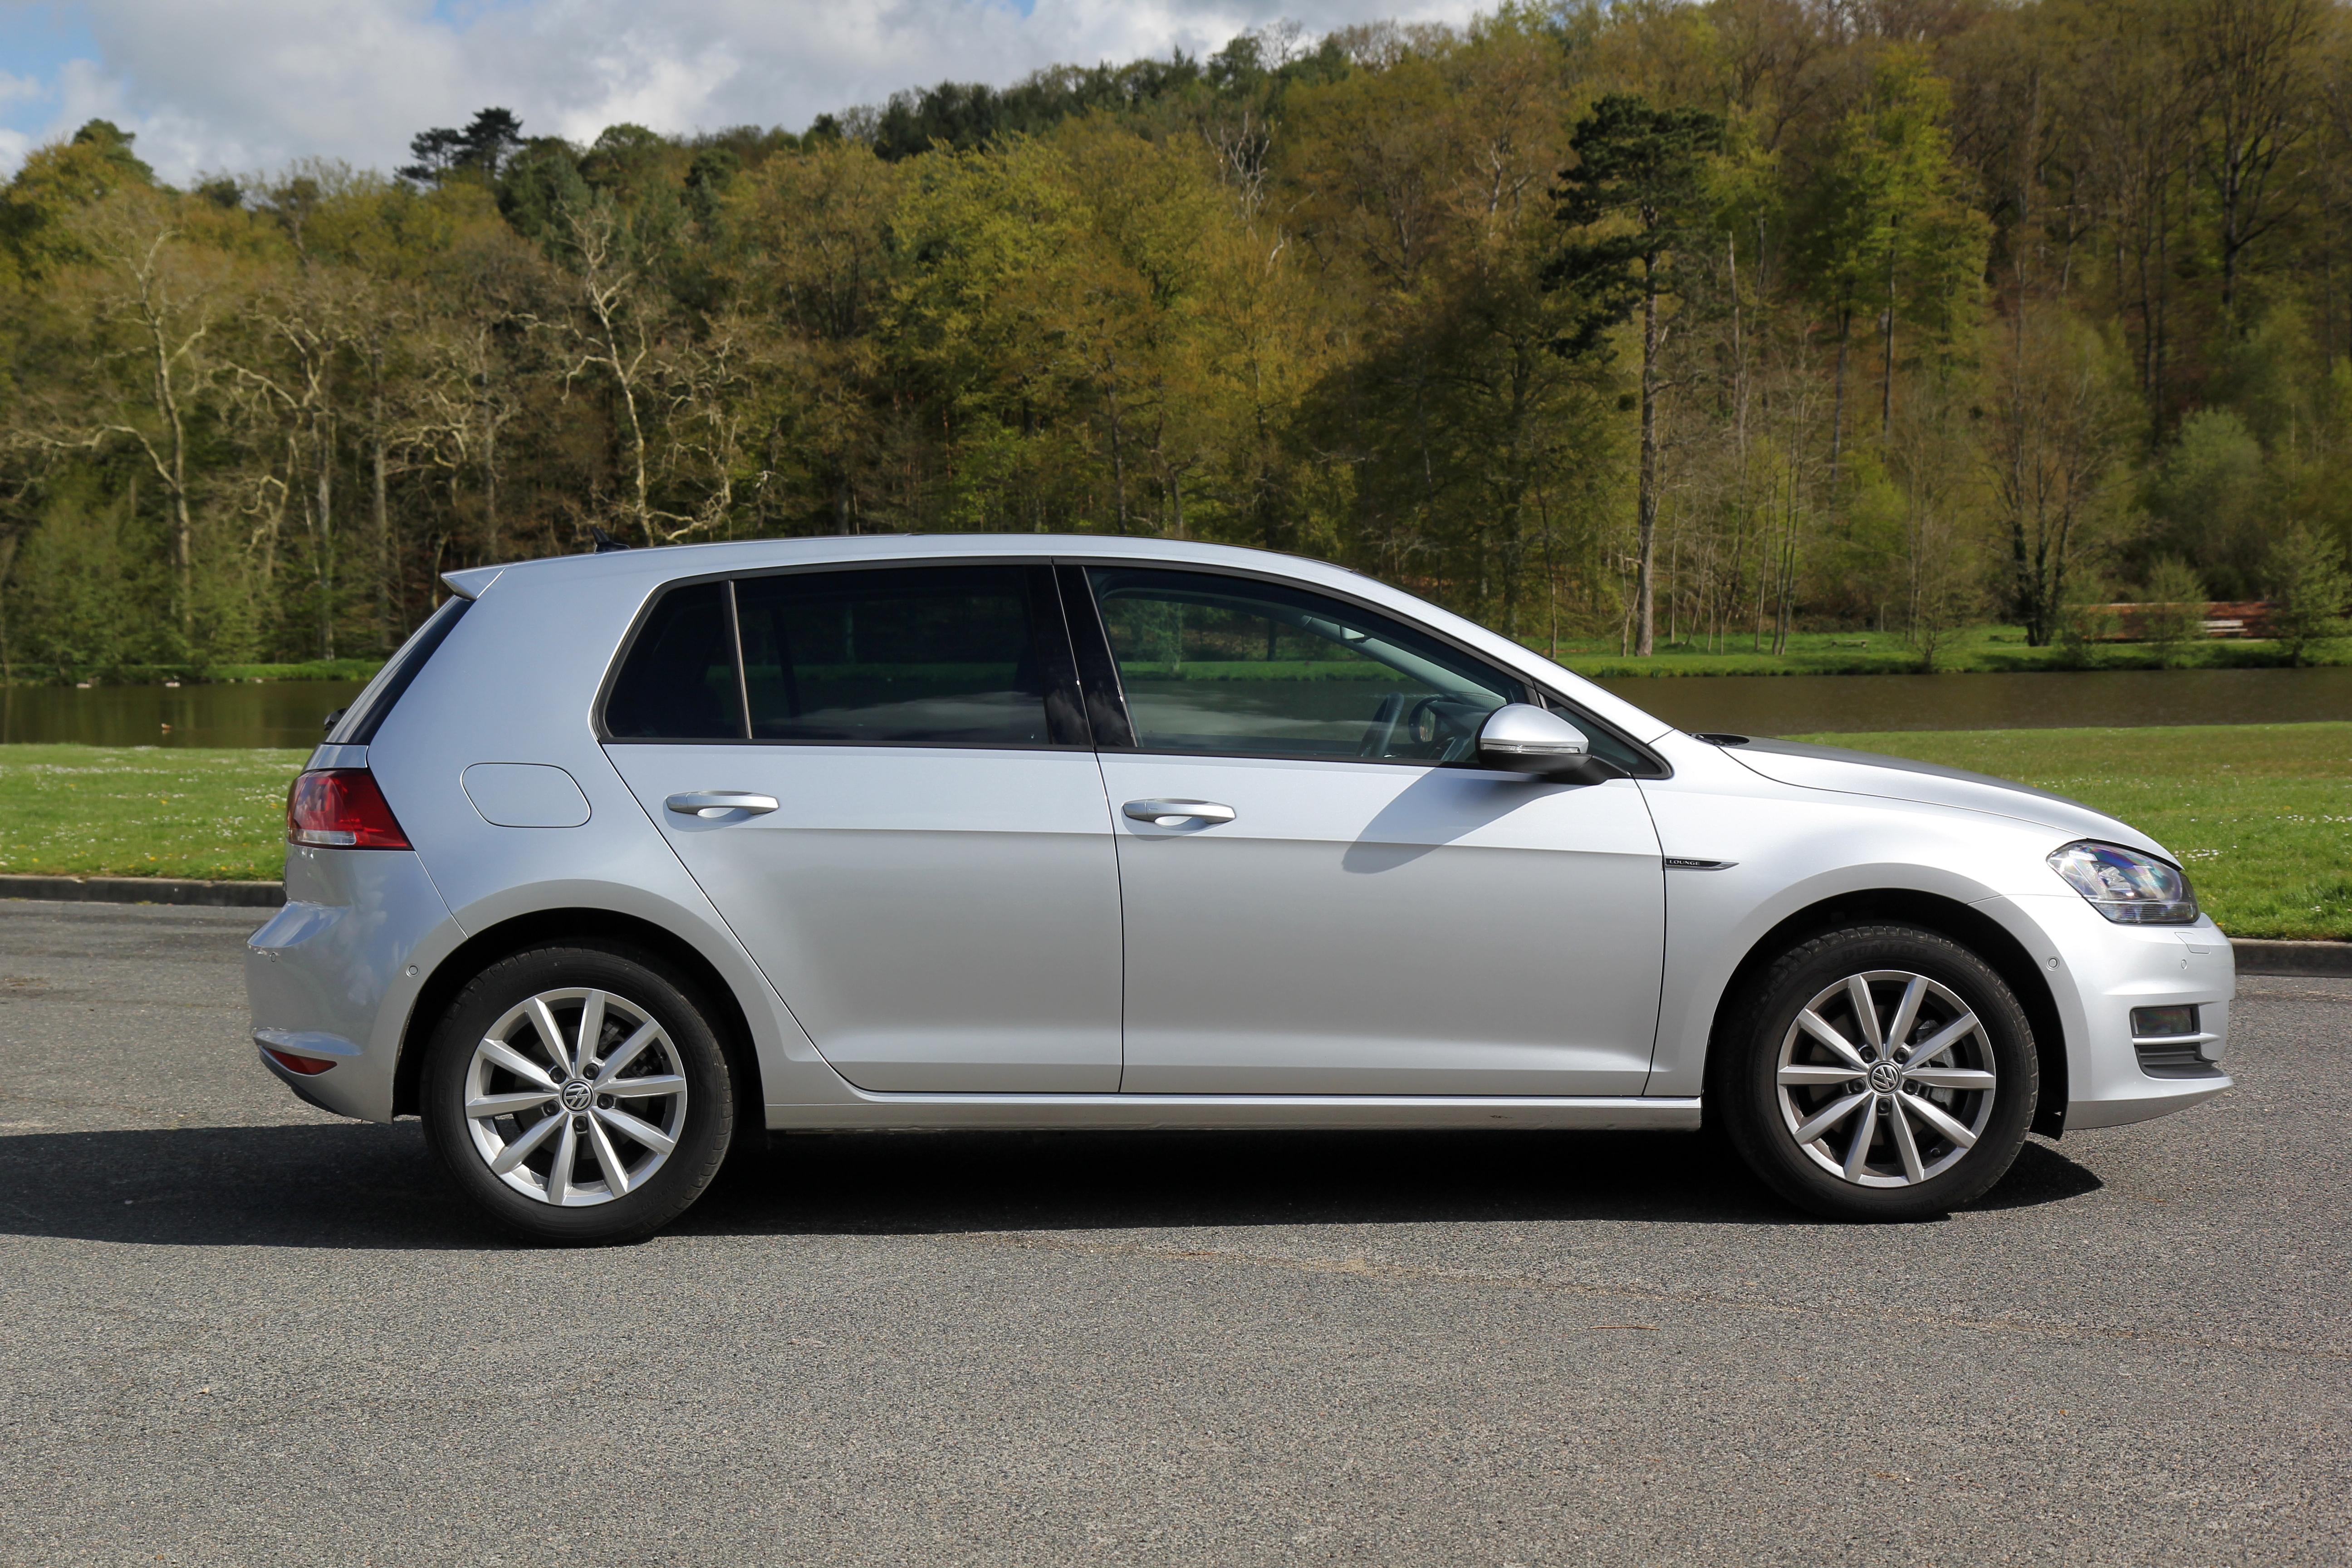 Comparativa: Opel Astra VS Renault Megane VS Volkswagen Golf  S0-comparatif-video-renault-megane-vs-opel-astra-vs-volkswagen-golf-la-deuxieme-tentative-sera-t-elle-la-bonne-378190